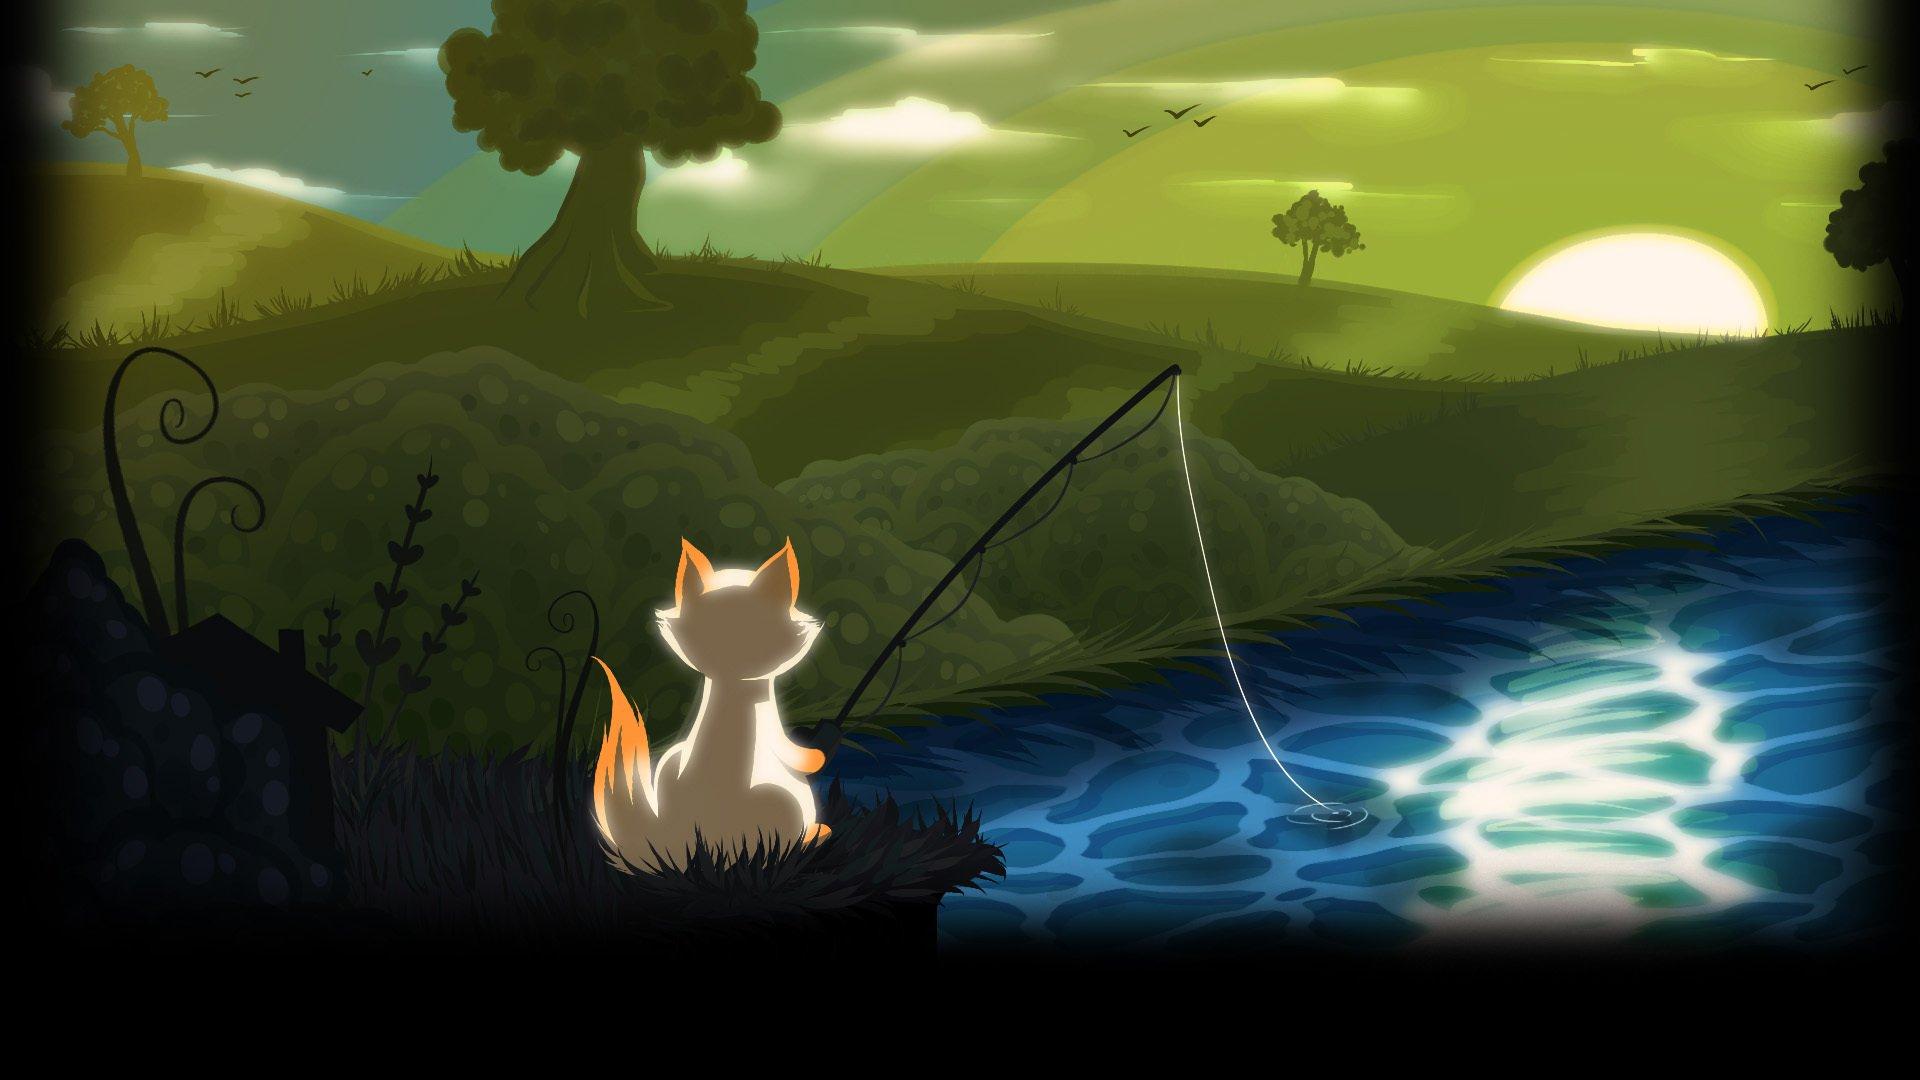 Cat Goes Fishing Full Hd Tapeta And T O 1920x1080 Id